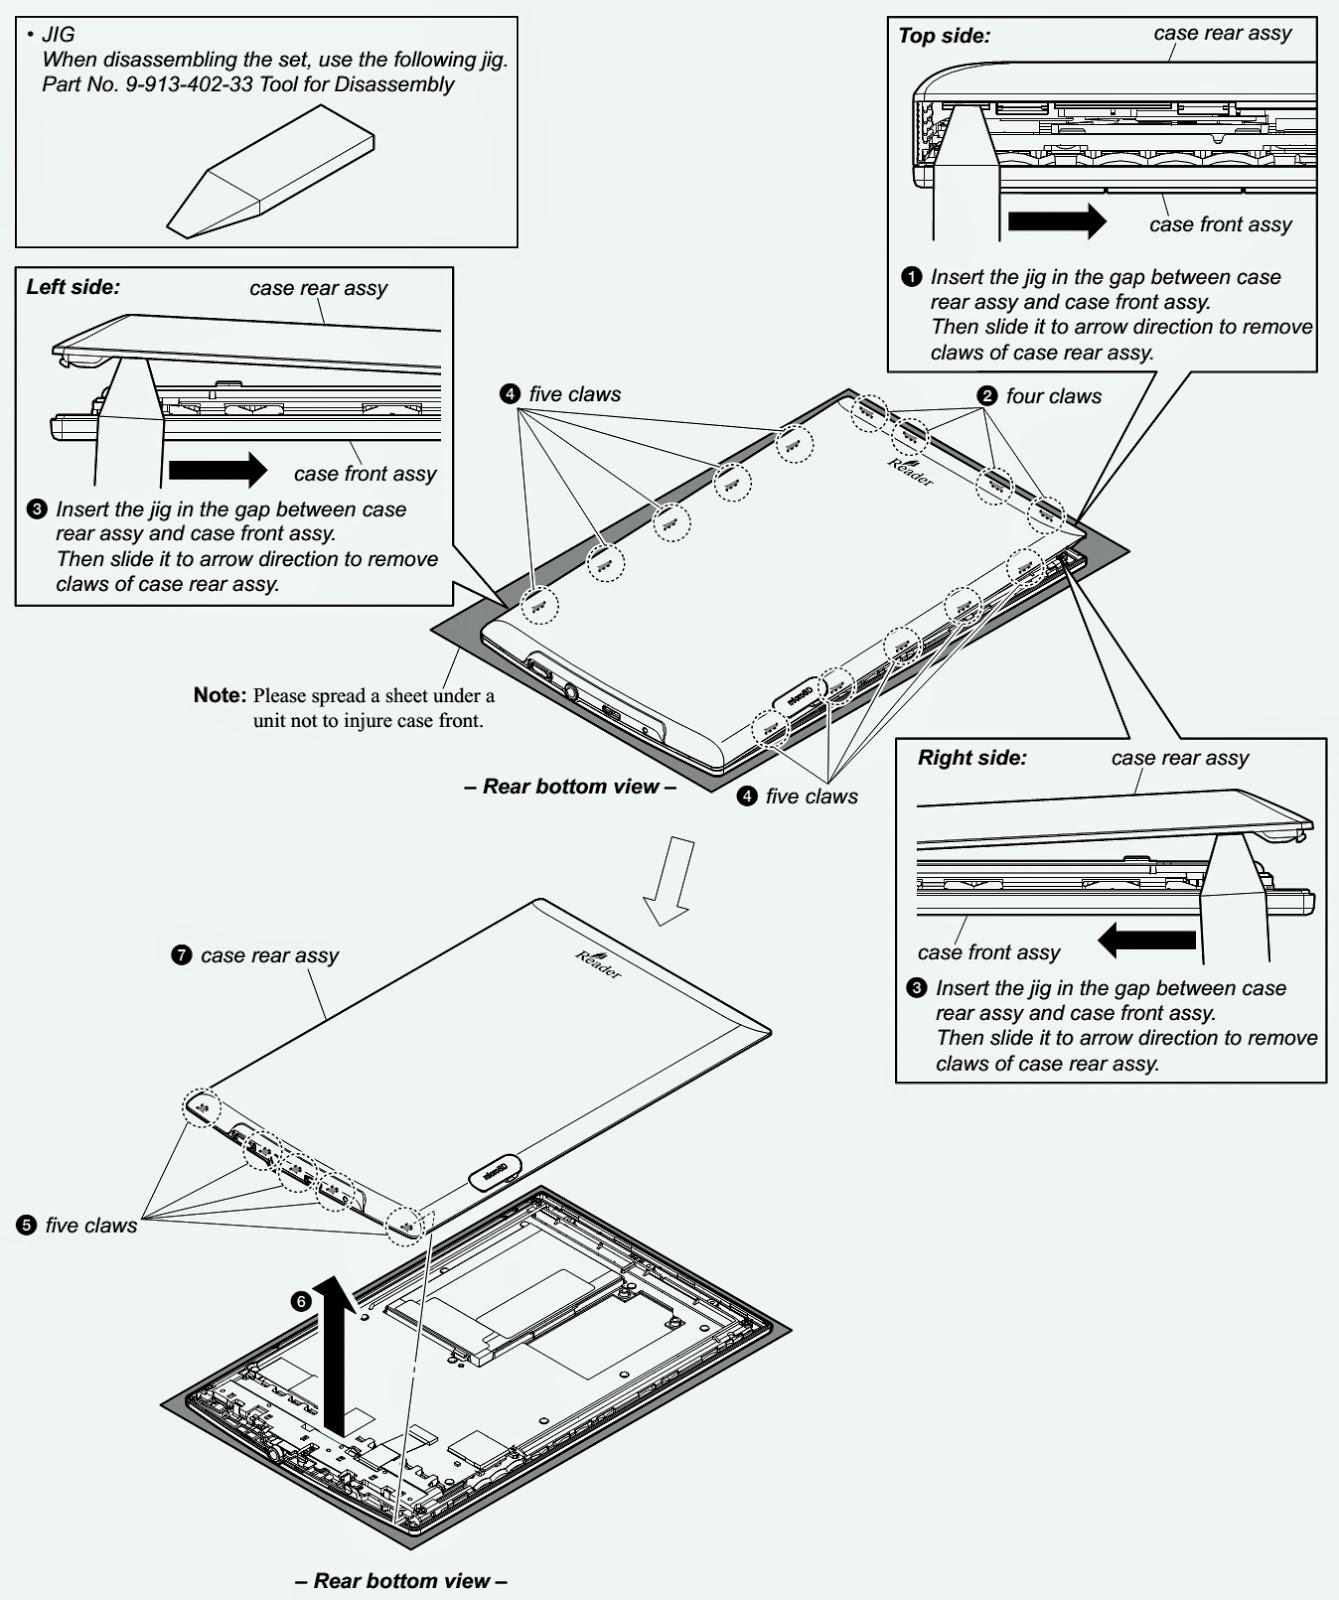 Wiring Schematic Diagram Sony Prs T1 Digital Book Reader Main Board